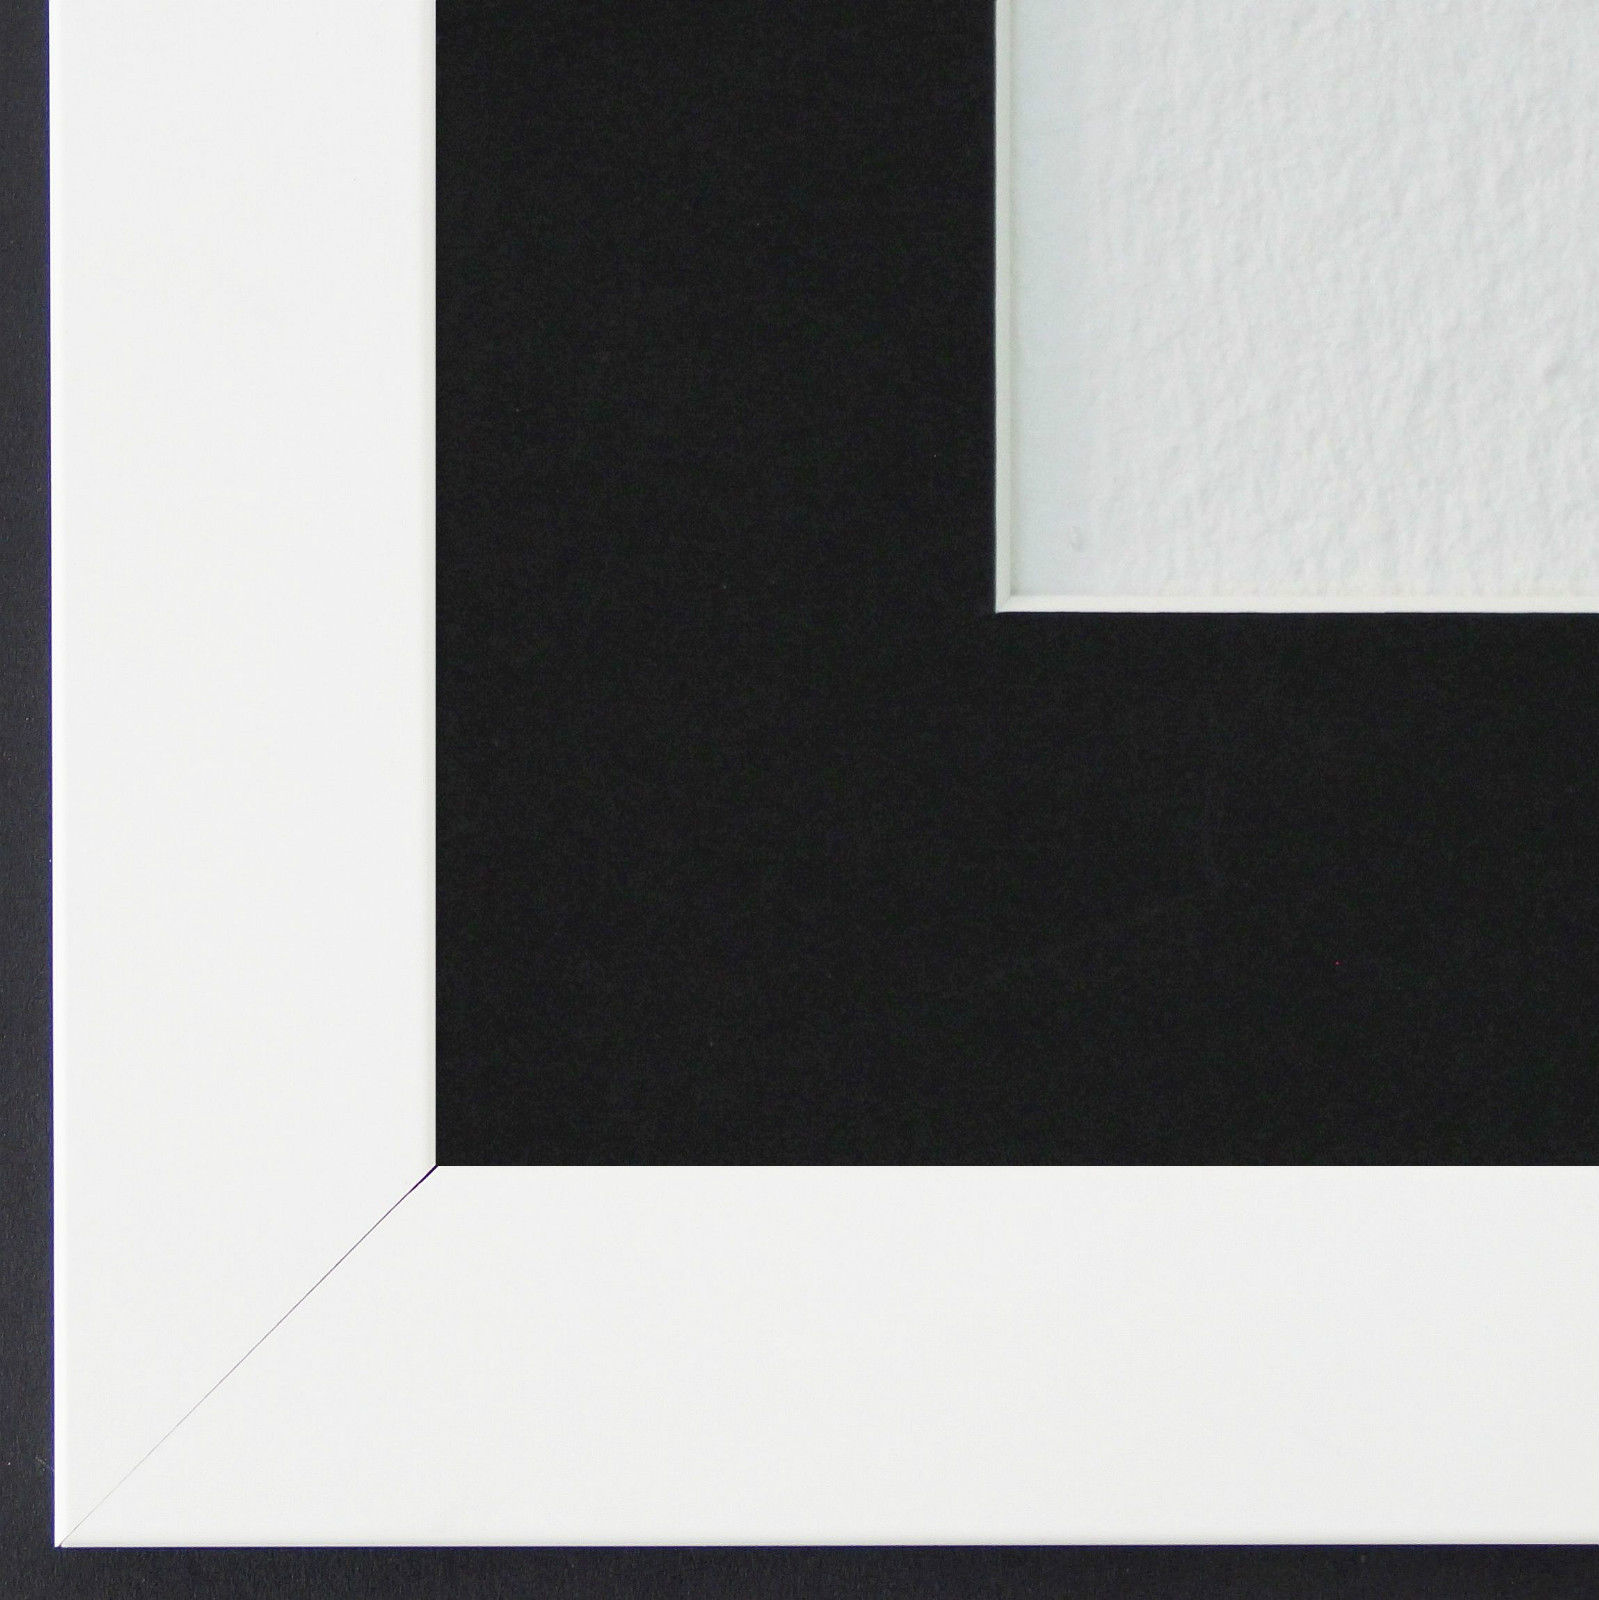 Schön Bilderrahmen 12x12 Bilder - Benutzerdefinierte Bilderrahmen ...